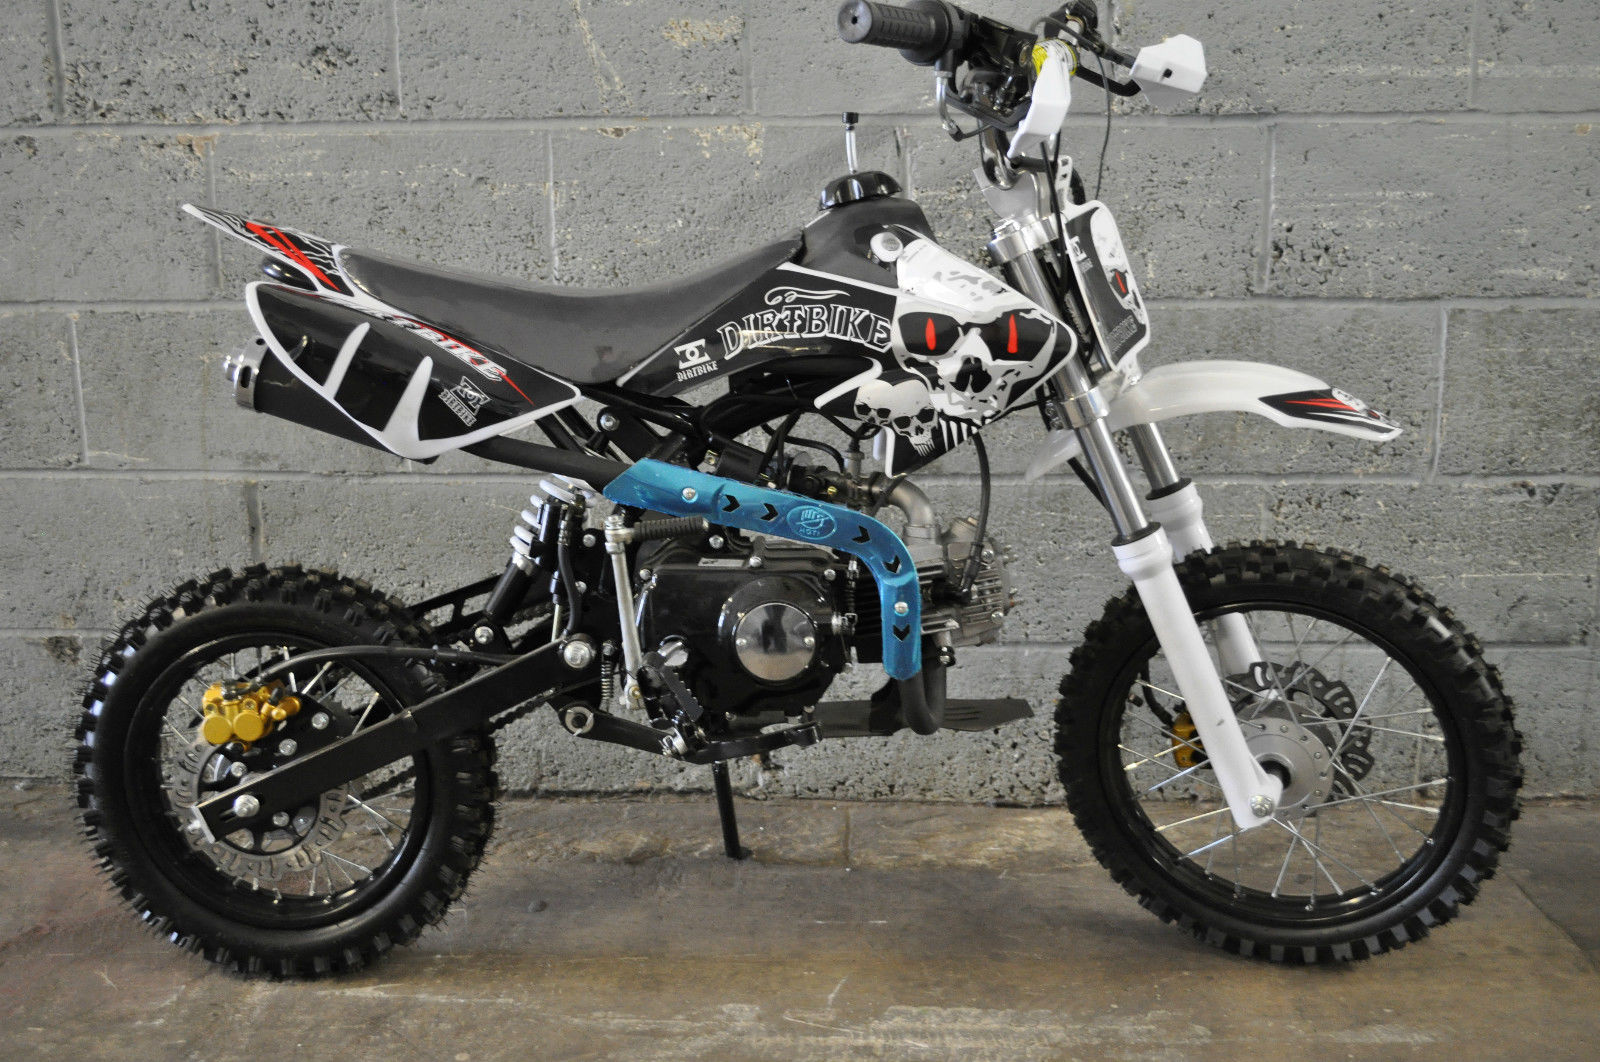 new 2014 mxb 125cc pit bike dirt bike atv motorcross 4 stroke engine. Black Bedroom Furniture Sets. Home Design Ideas